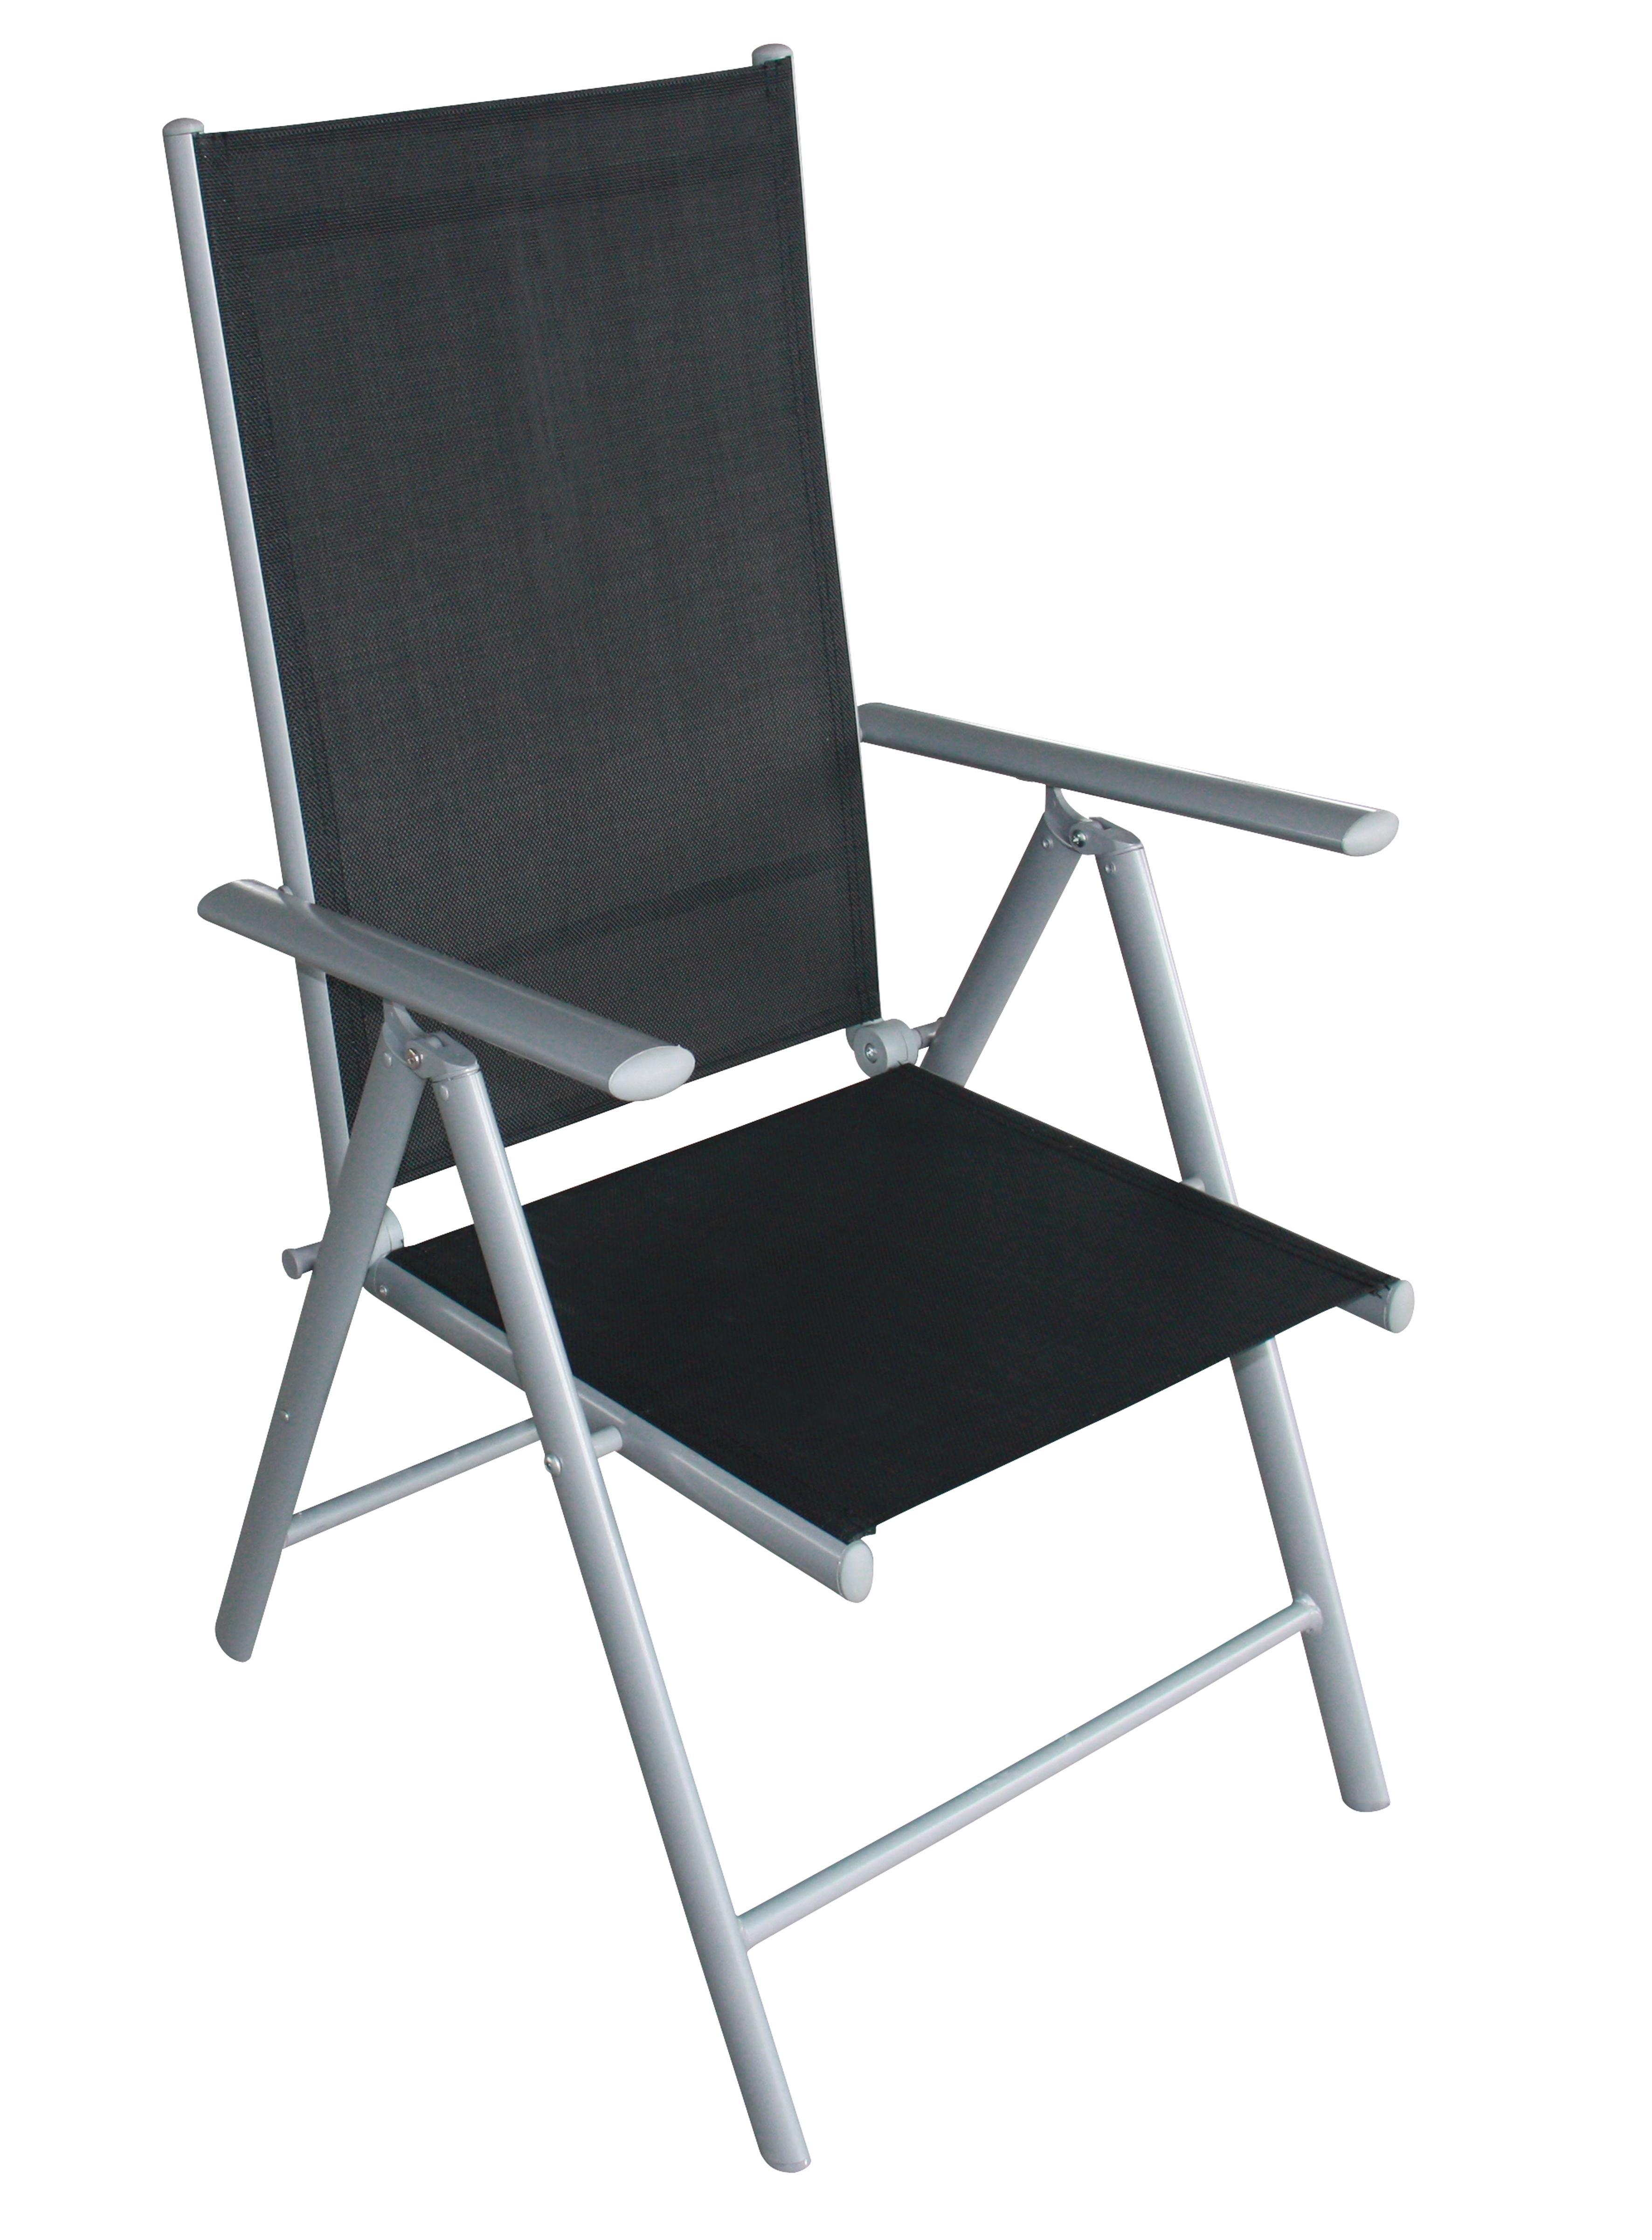 Klappsessel RAVENNA, Aluminium + Kunstgewebe schwarz, 4 Stück